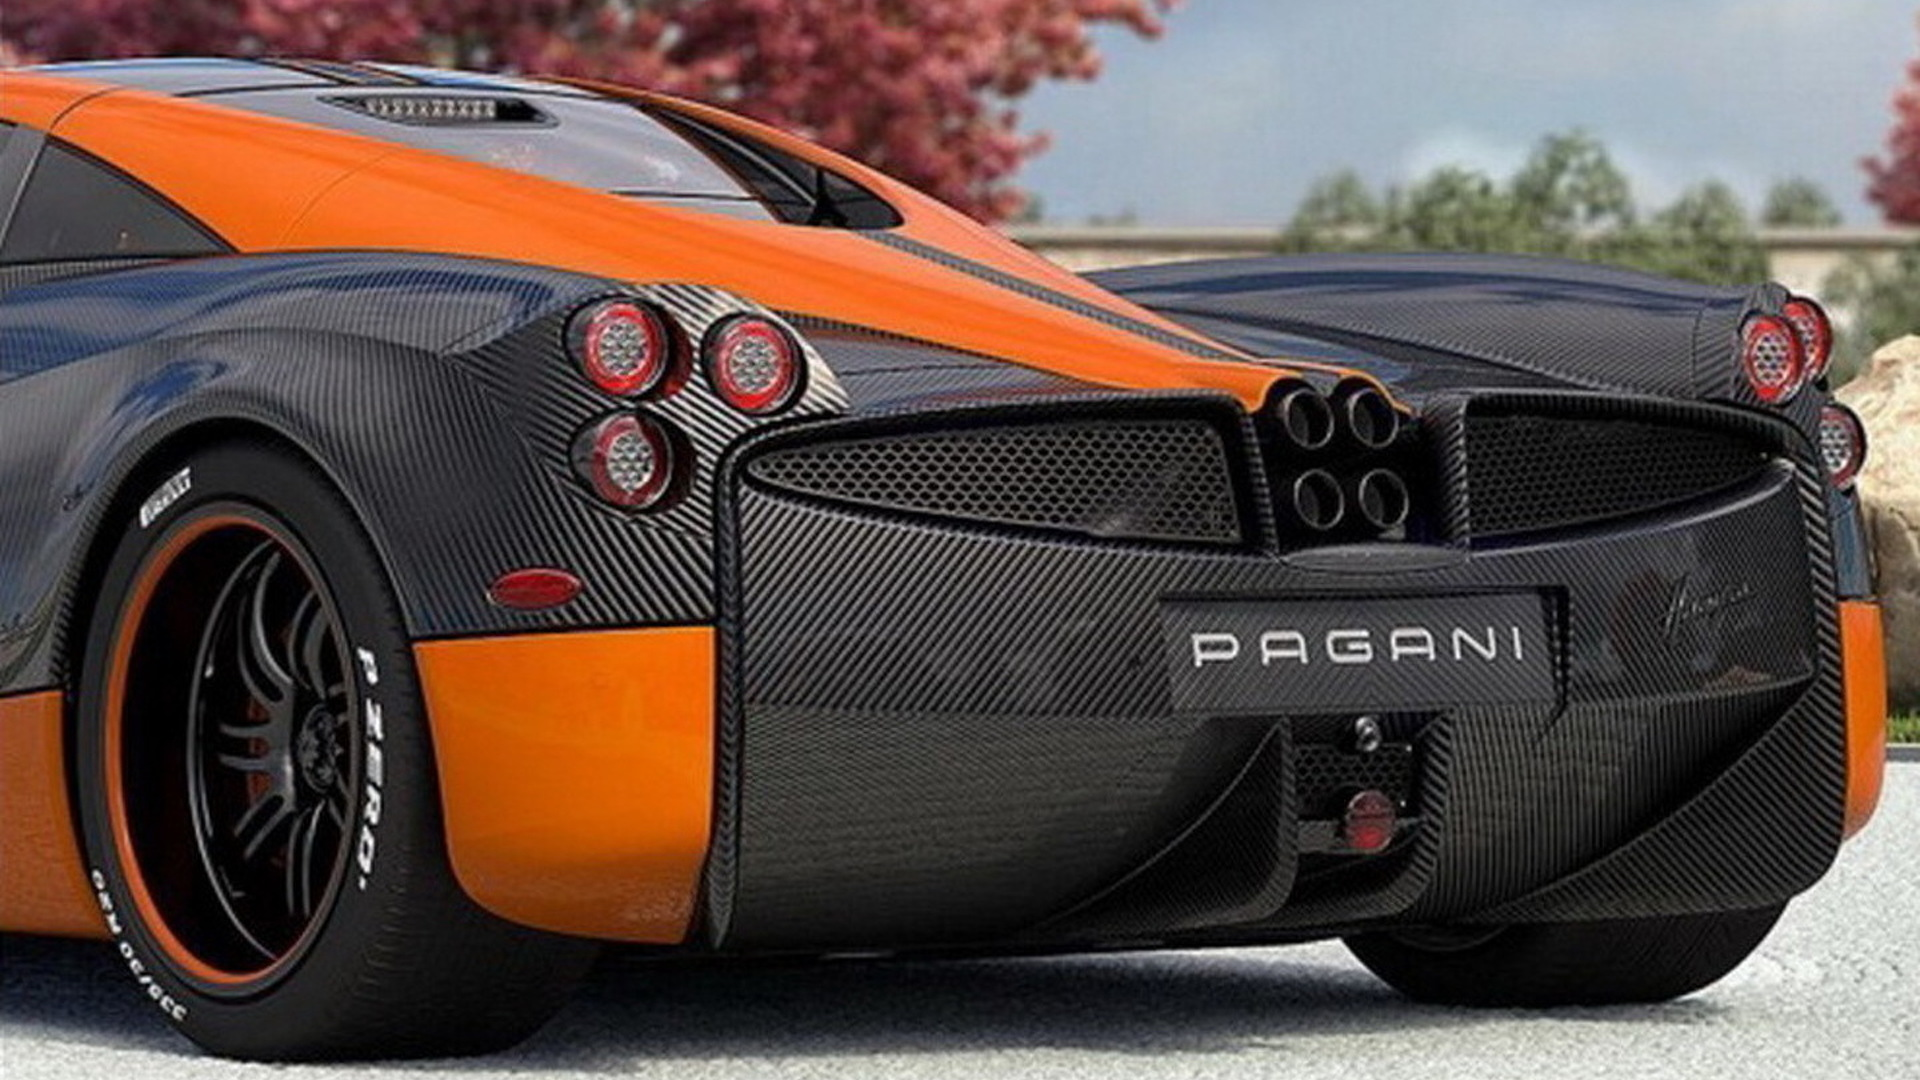 Pagani Huayra News and Reviews | Motor1.com UK